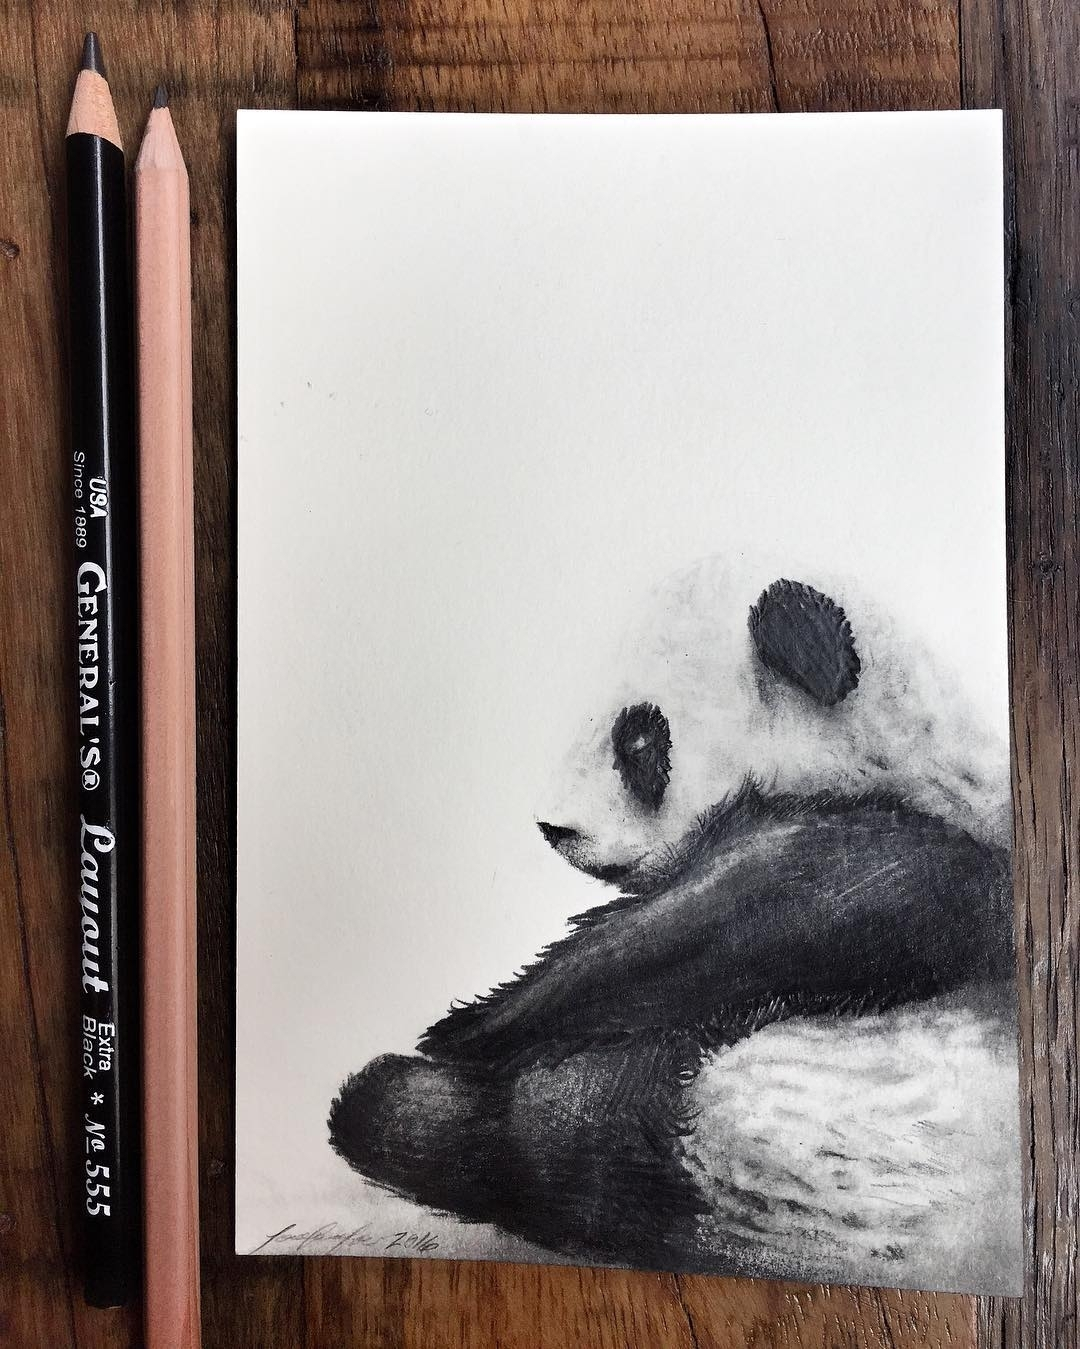 13-Panda-Jonathan-Martinez-Art-of-the-Endangered-Paintings-and-Drawings-www-designstack-co